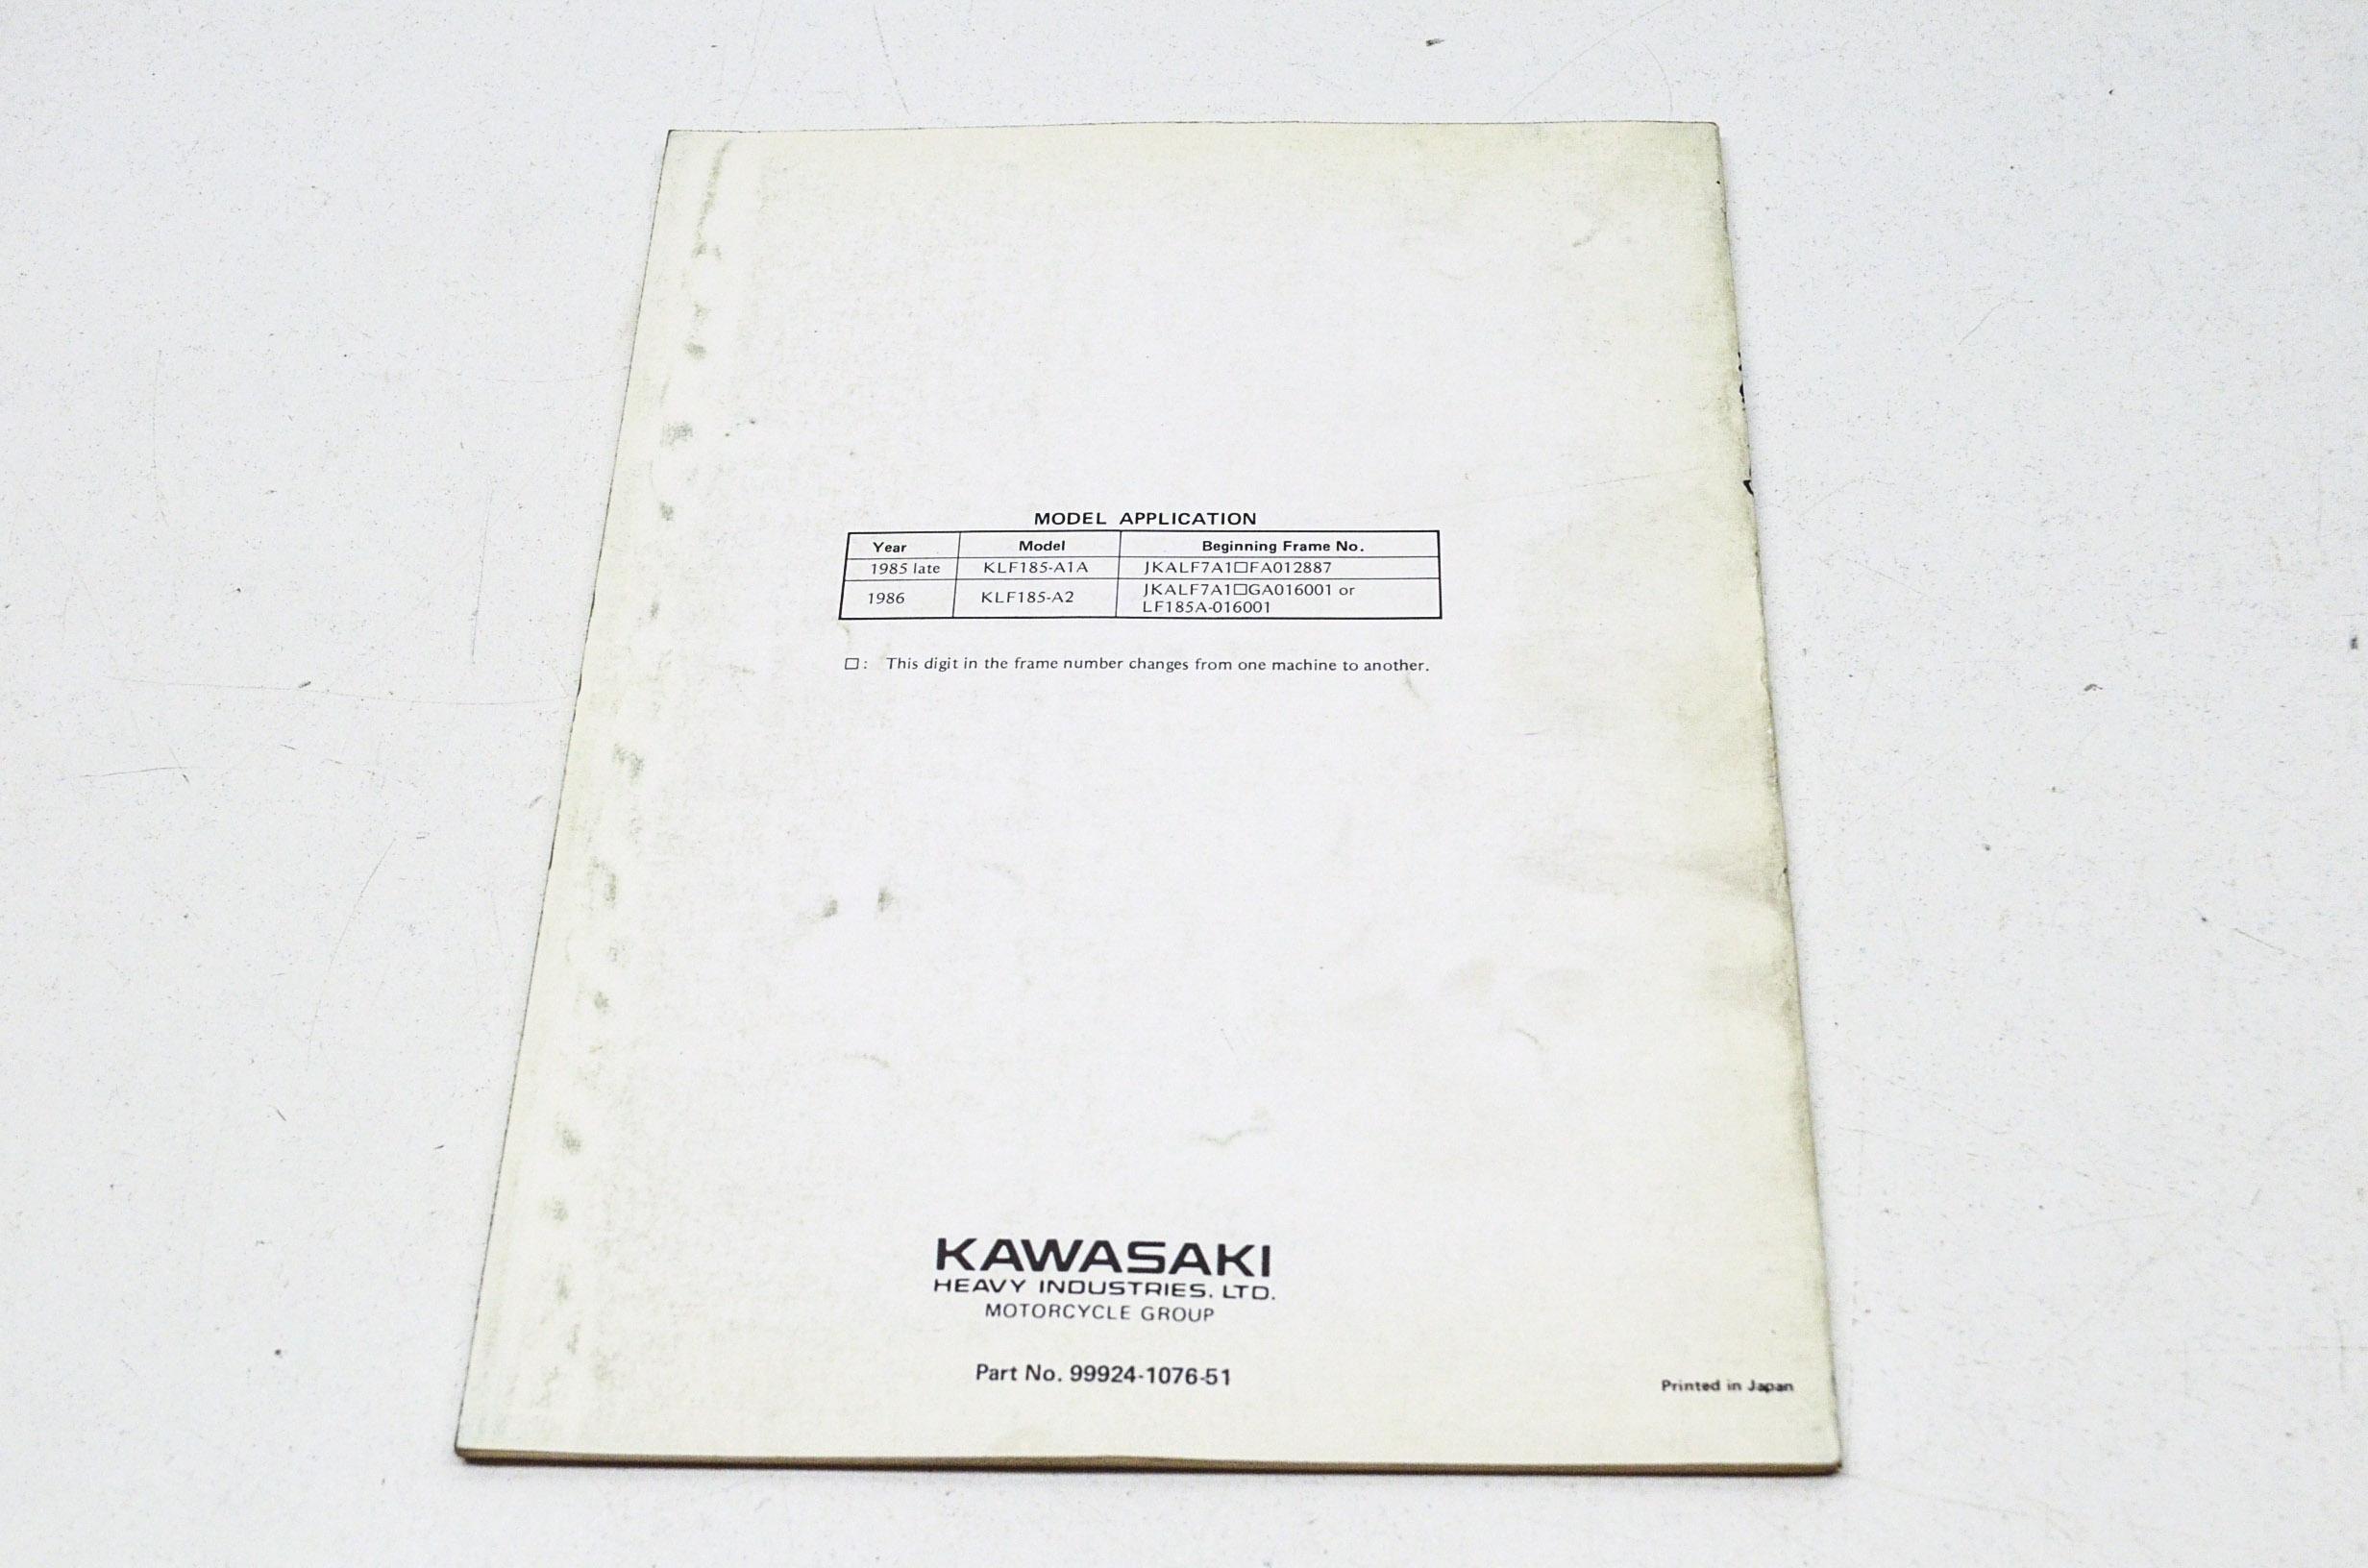 OEM Kawasaki 99924-1076-51 All Terrain Vehicle Service